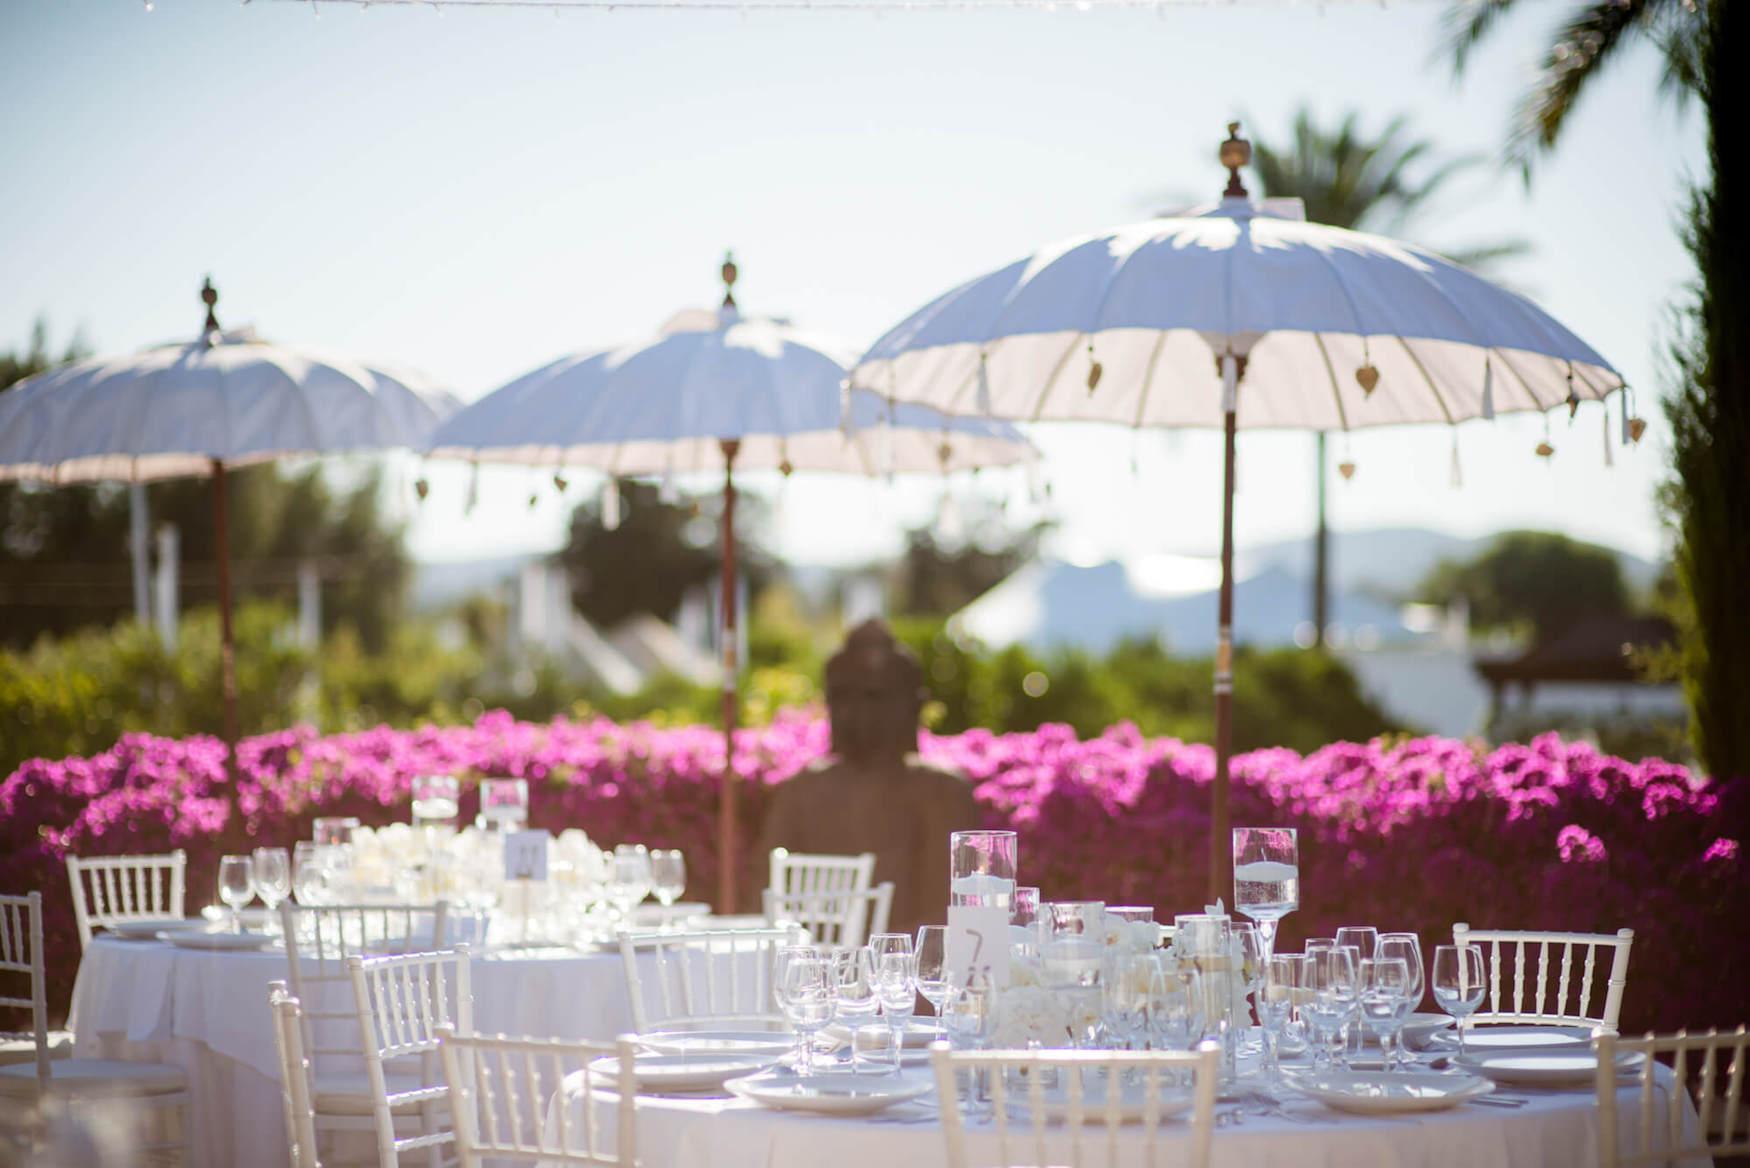 outdoor table setting marrocan sunshade bougainvillea